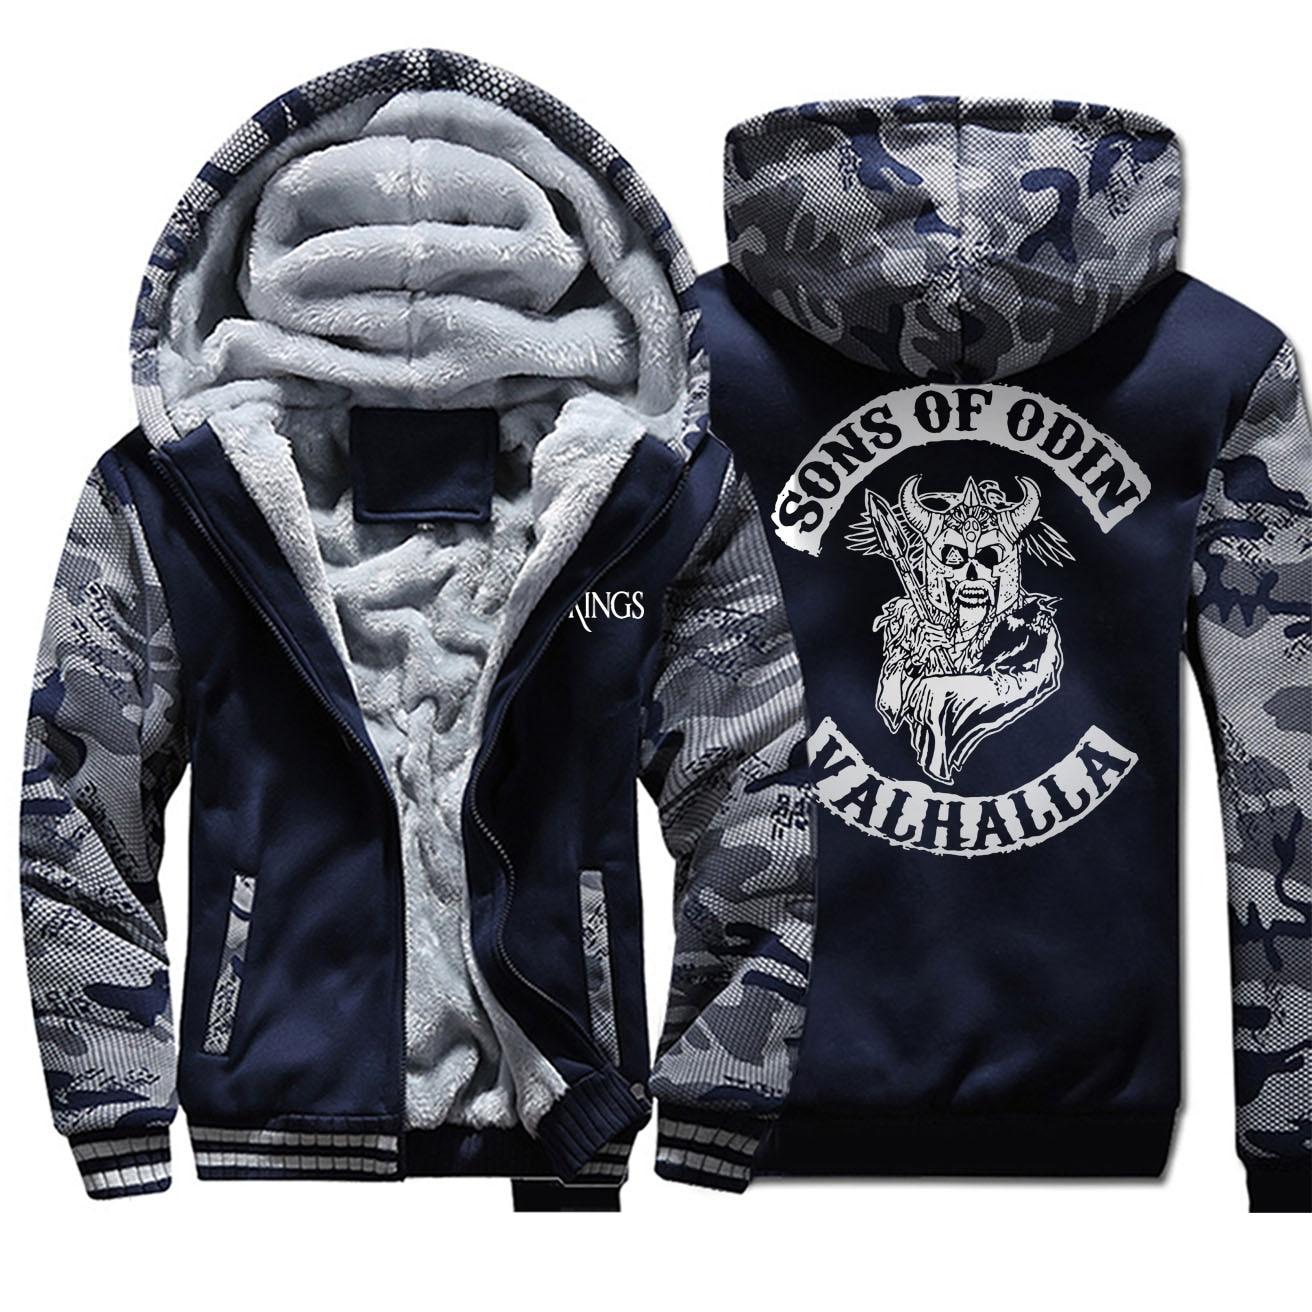 Sons Of Odin TV Show Vikings Valhalla Men Hoodies 2019 Winter Casual Camo Hoodies Warm Fleece Men's Fashion Zipper Jackets